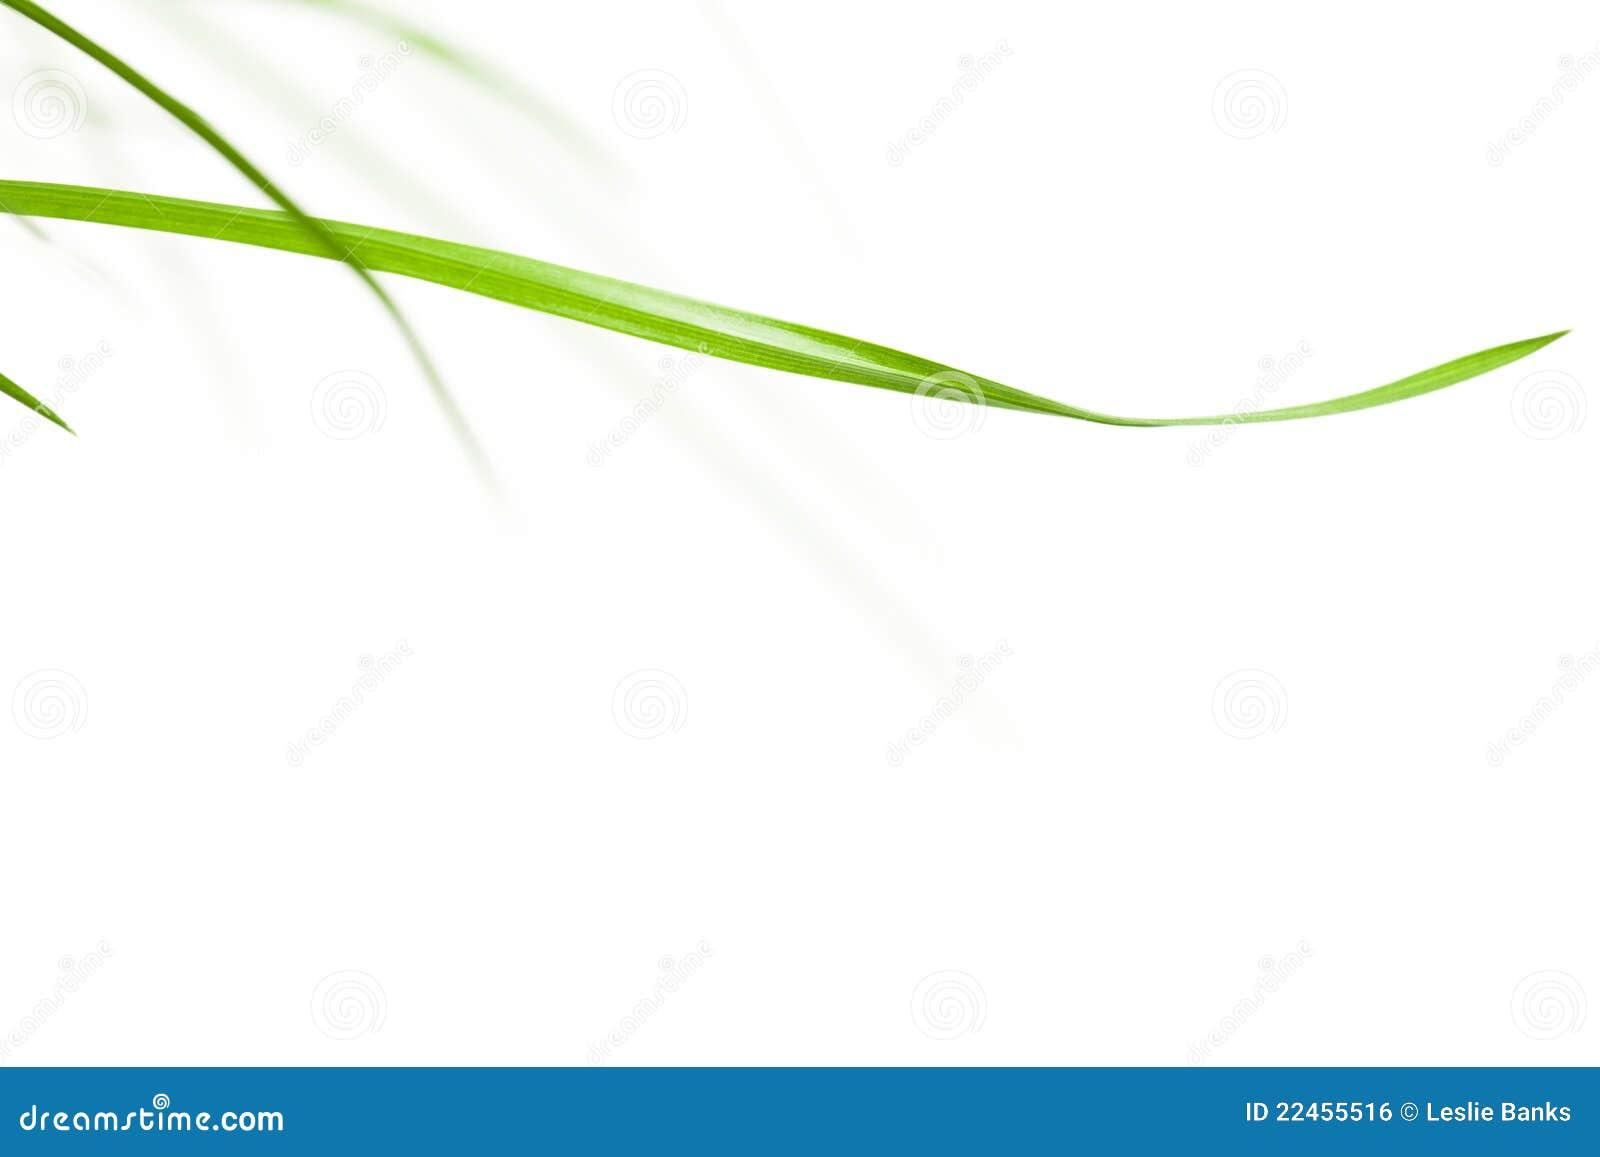 Lámina de la hierba horizontal